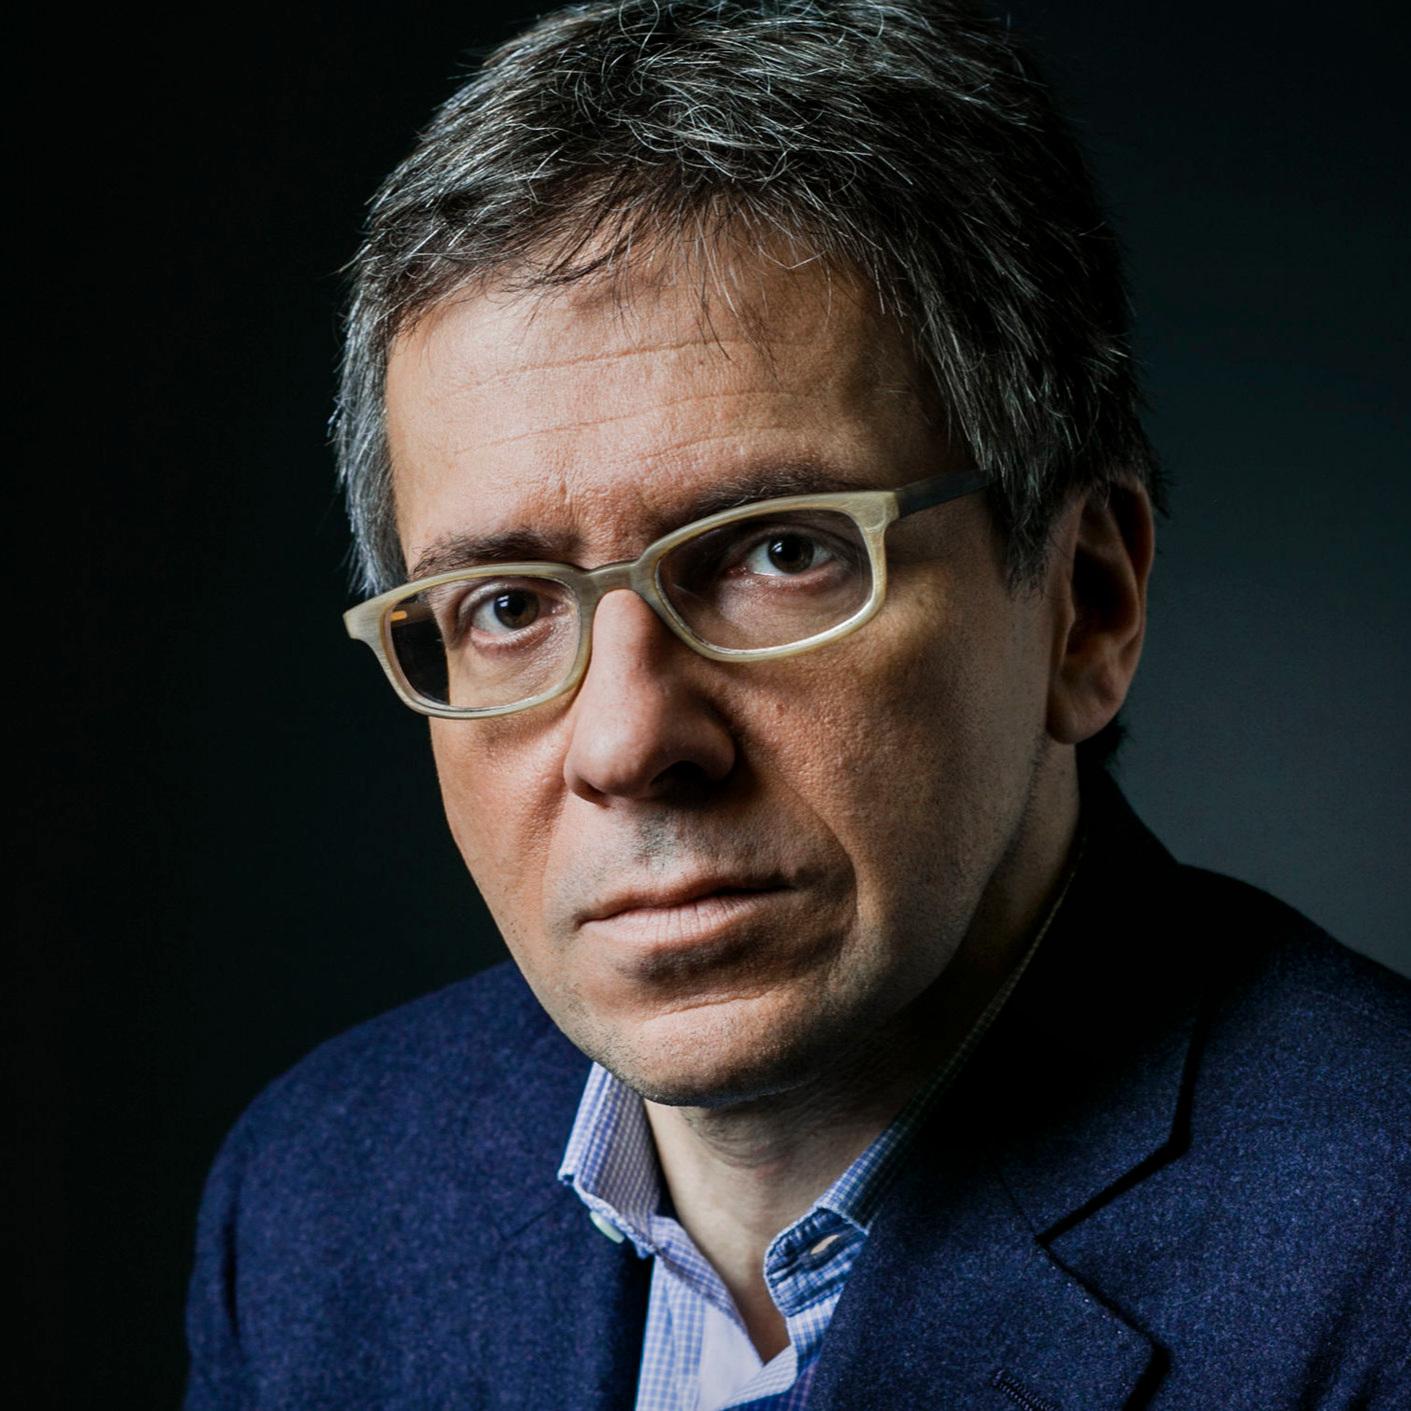 Ian Bremmer - Global Political Risk Guru